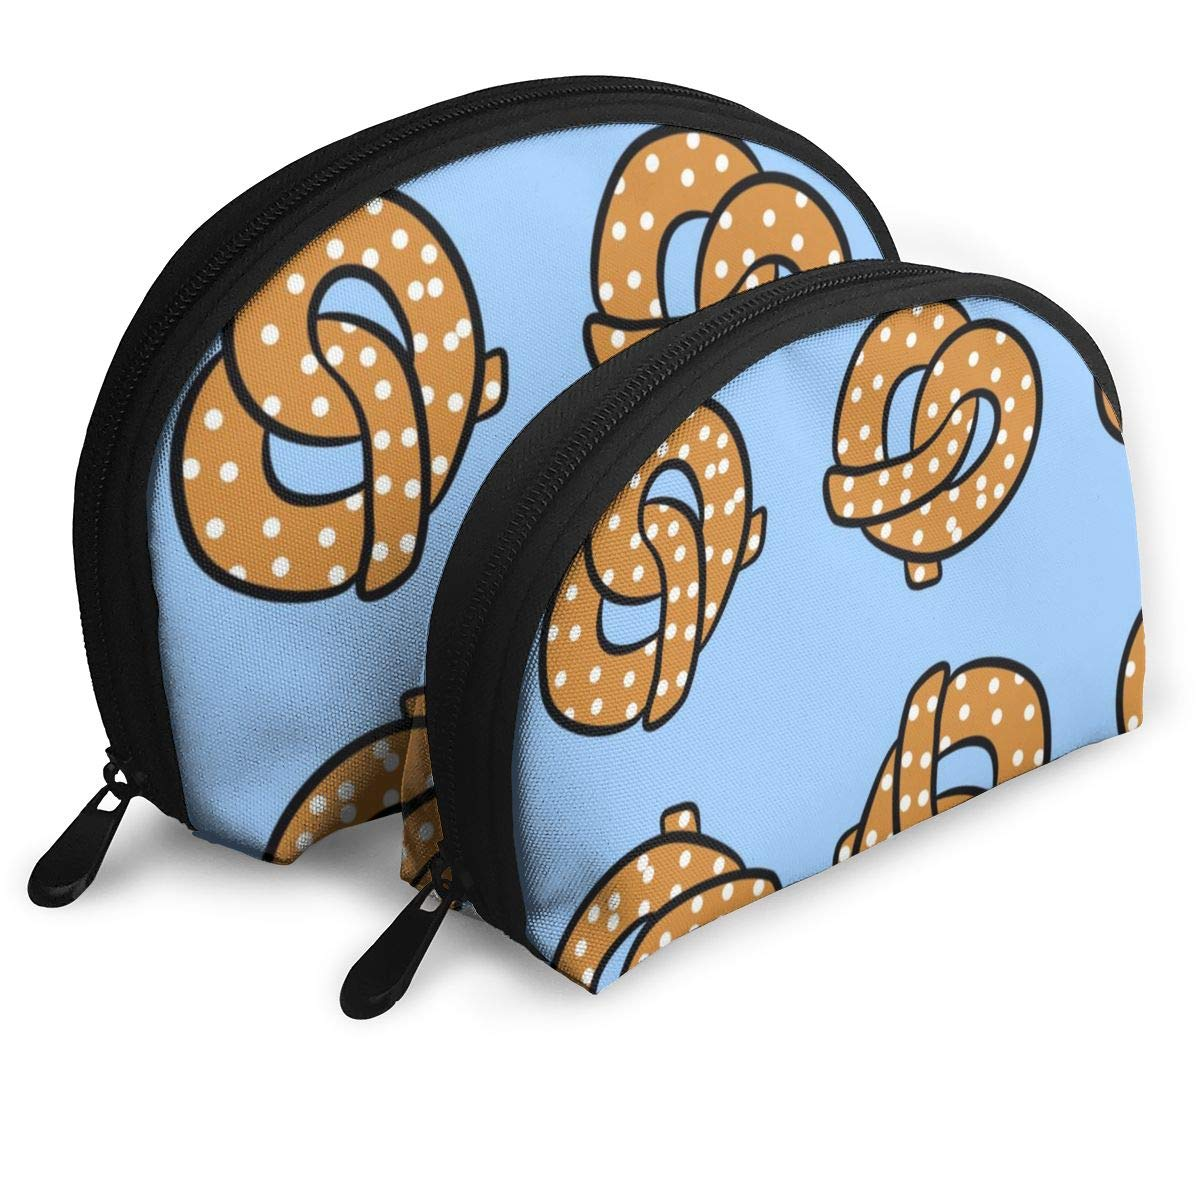 Half Moon Cosmetic Beauty Bag,Pretzel Handy Cosmetic Pouch Clutch Makeup Bag For Women Girls